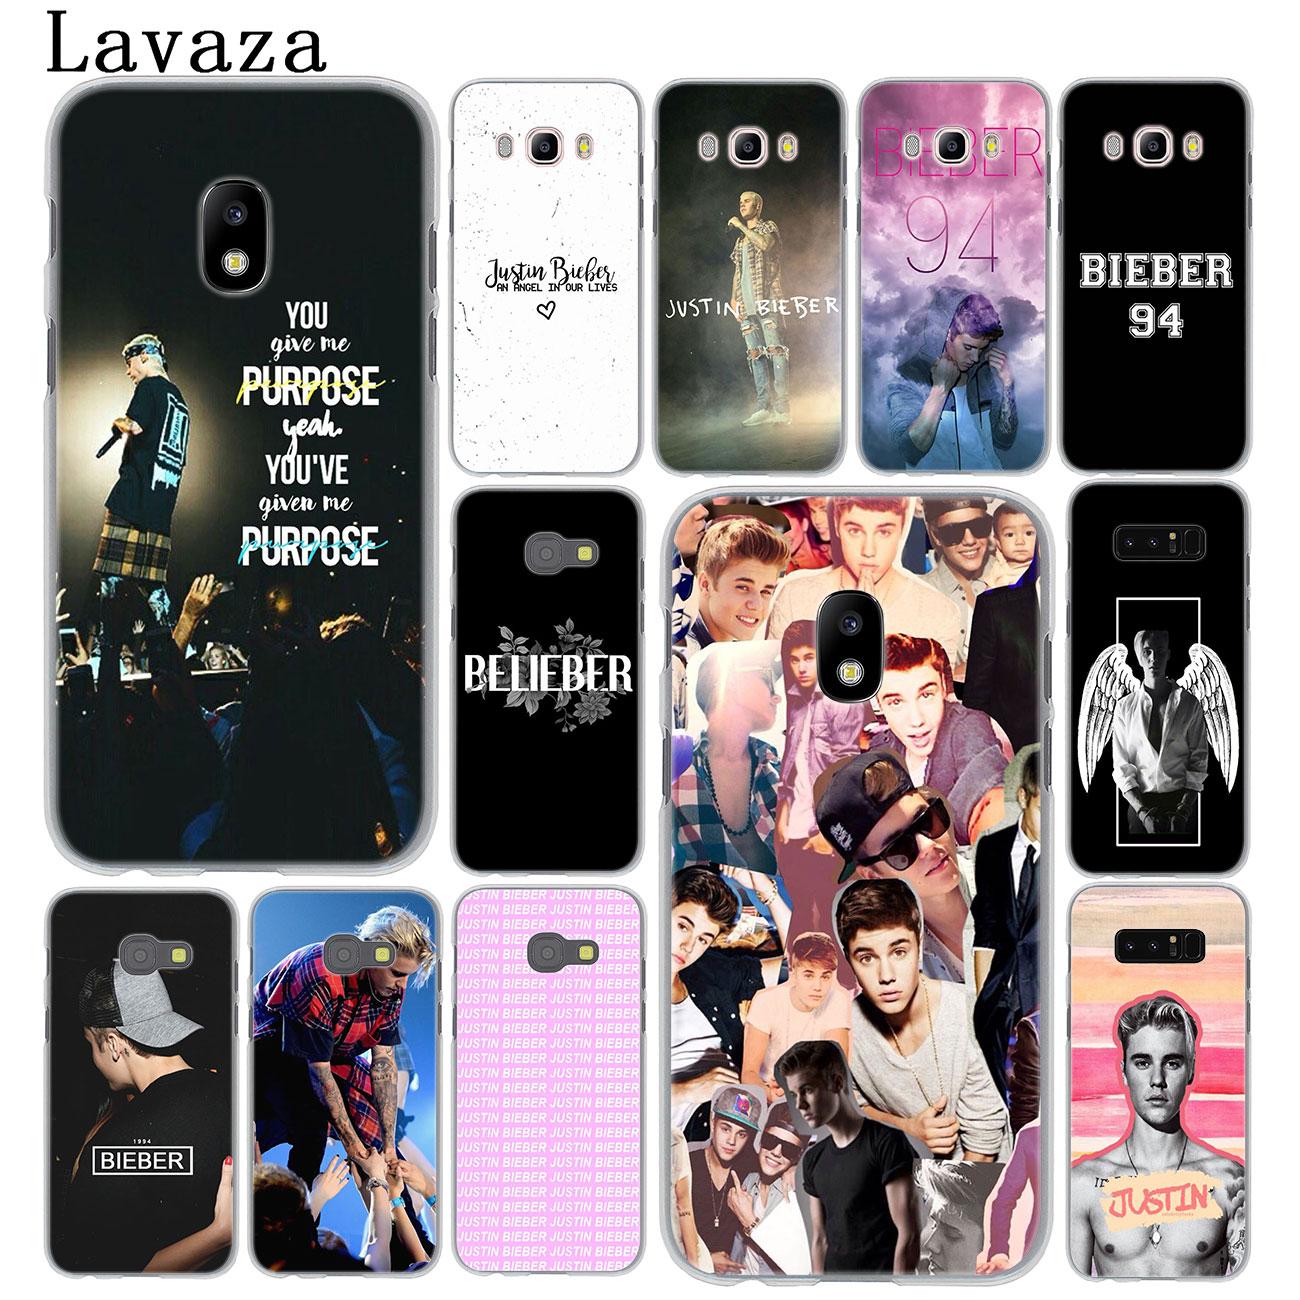 Lavaza Justin Bieber Hard Phone Case for Samsung Galaxy J5 J1 J2 J3 J7 2017 2016 2015 J5 Prime J7 US EU Version Cover